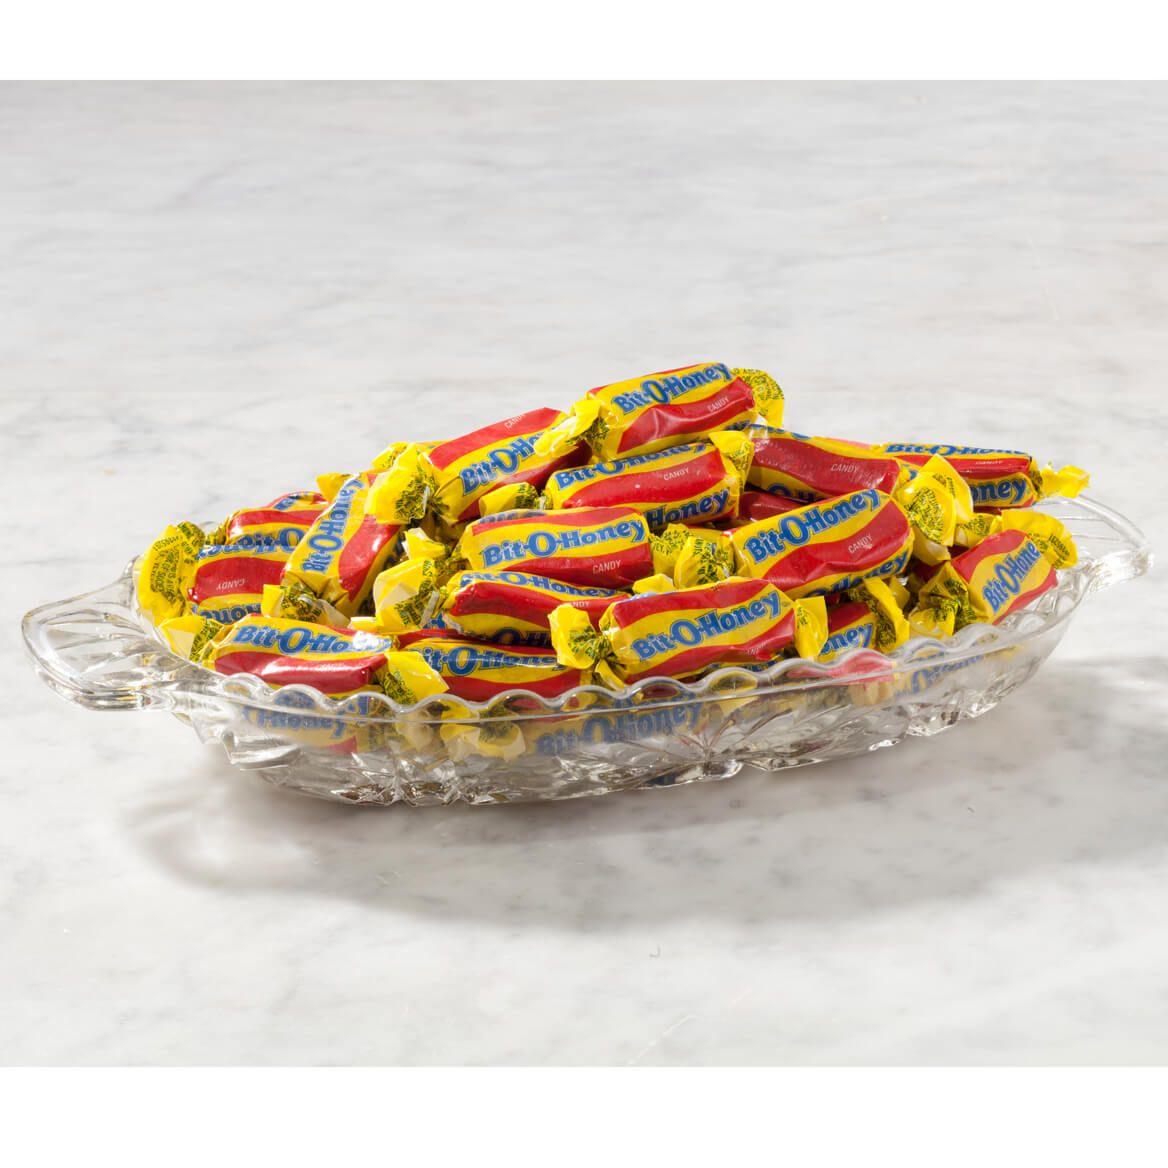 Bit-O-Honey Candy 9.5 oz.-331832